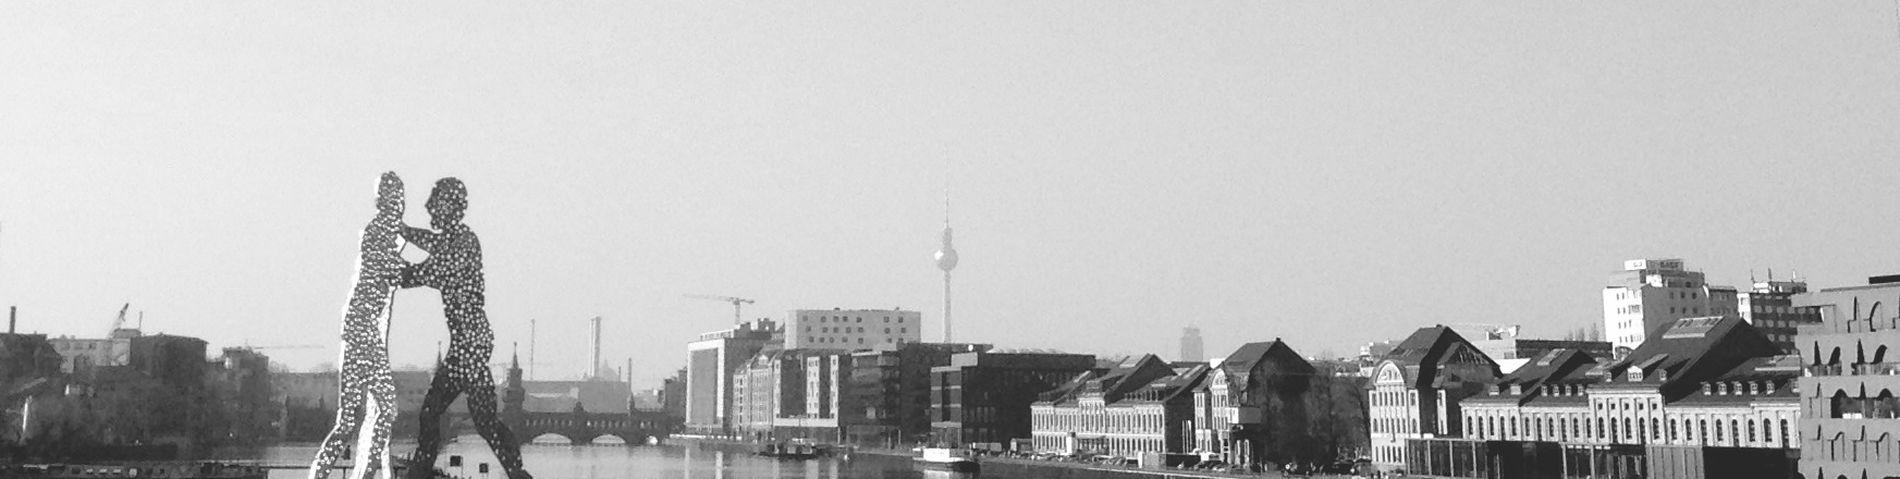 Berlin Urban Geometry Urban Life Architecture